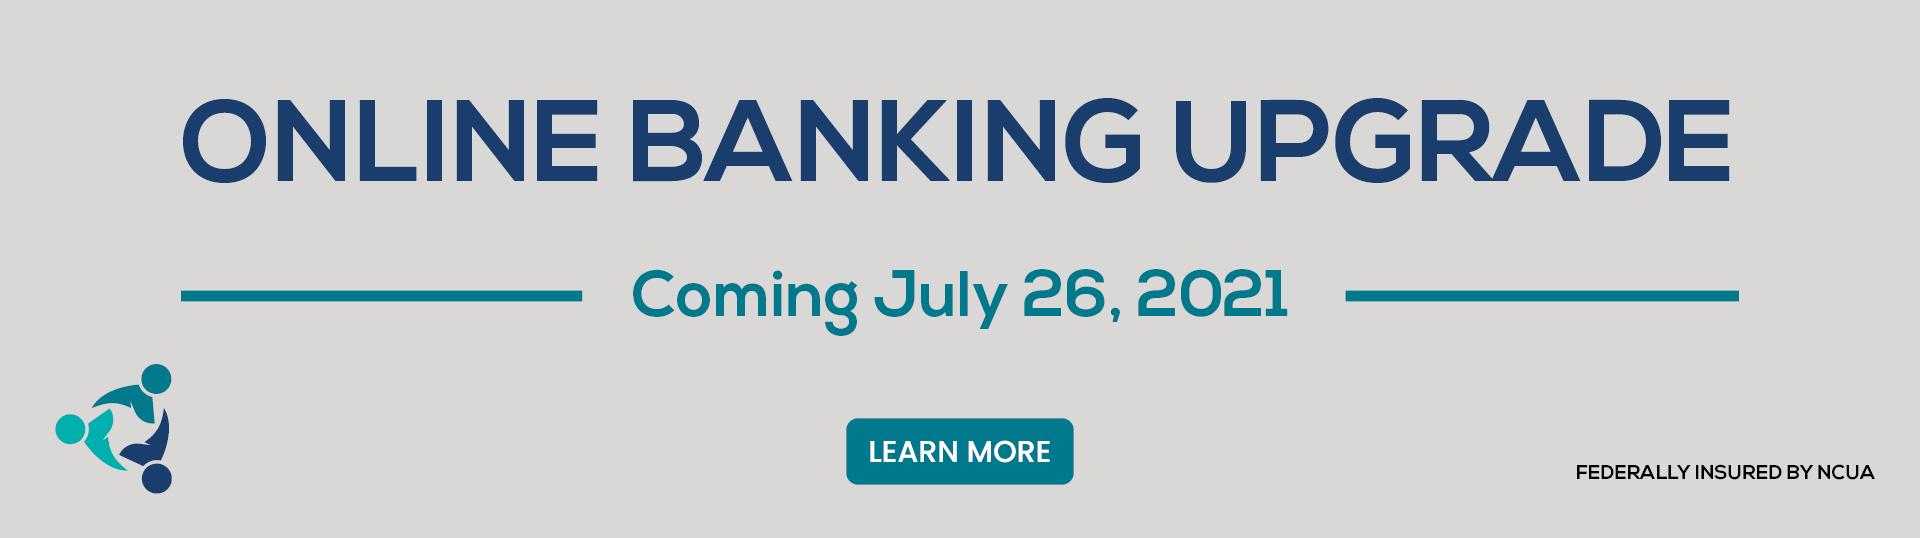 Online Banking Update website Banner